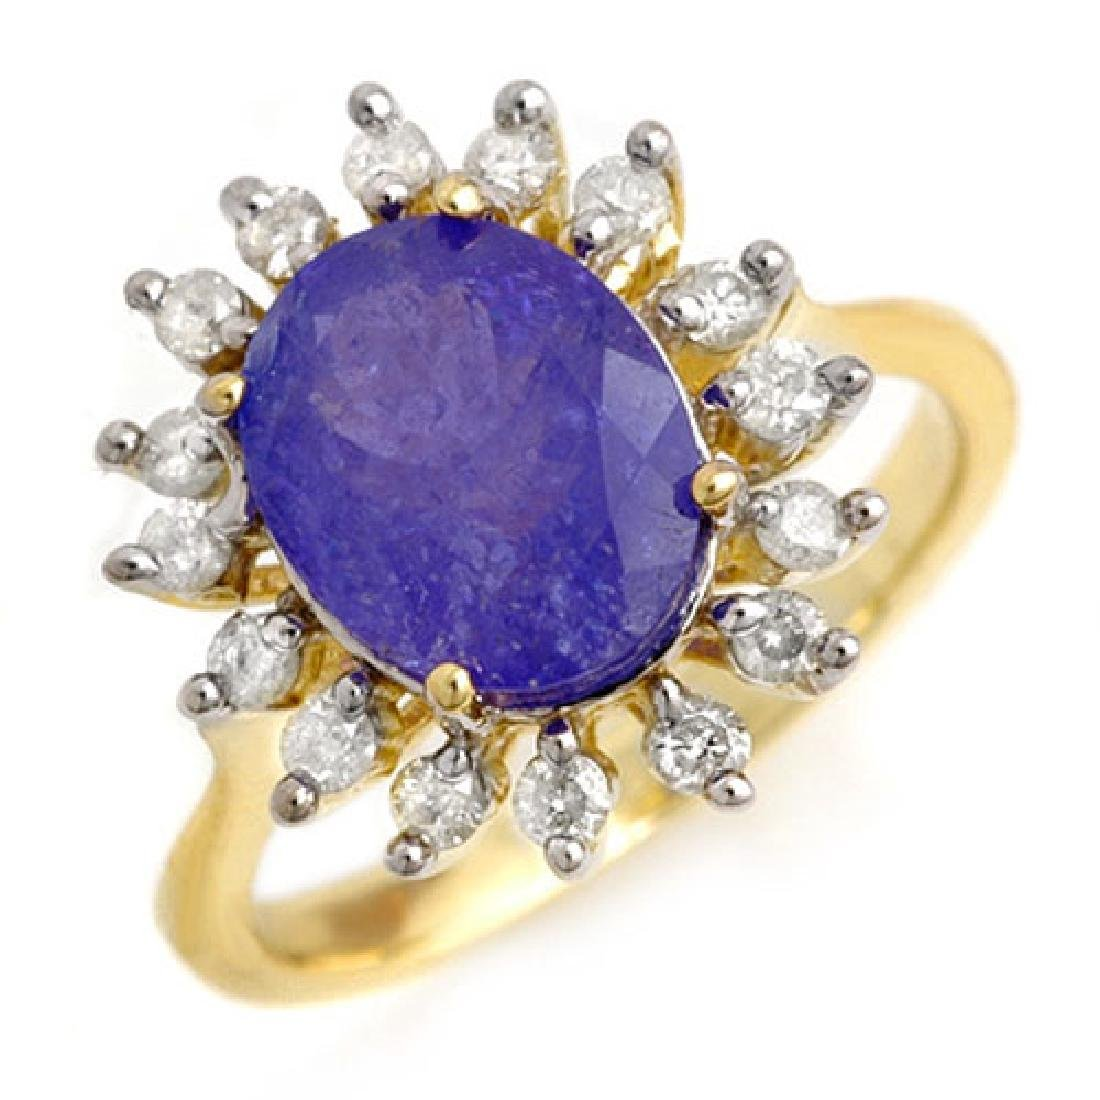 3.05 CTW Tanzanite & Diamond Ring 10K Yellow Gold